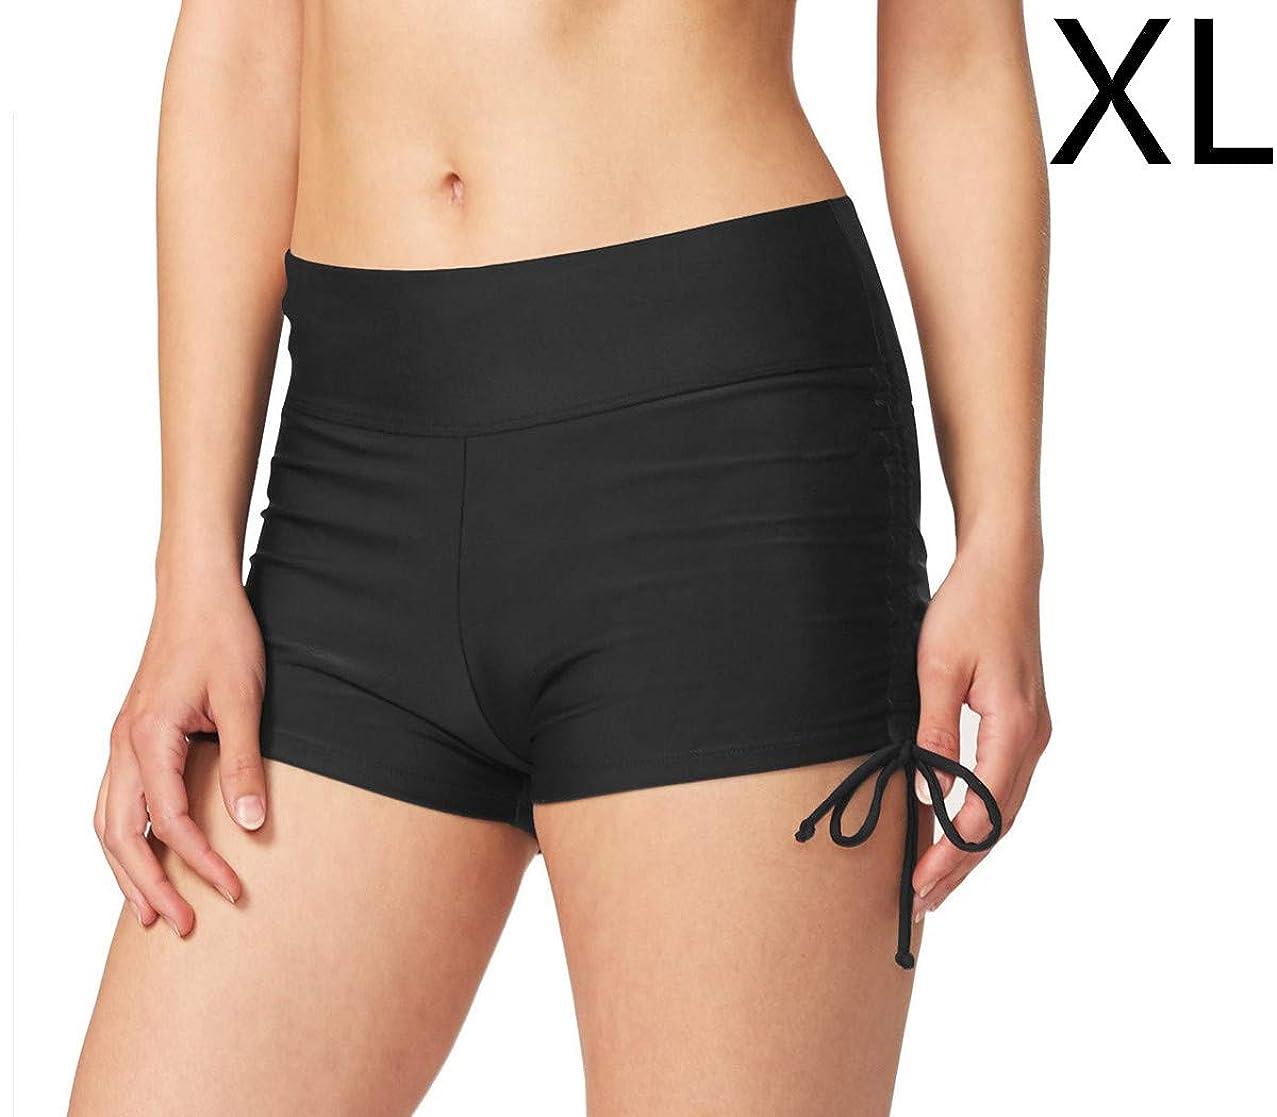 StyleZ Women's Beach Adjustable Tie Shorts Swim Boradshorts Bikini Bottom for Swimming Yoga Running Sport